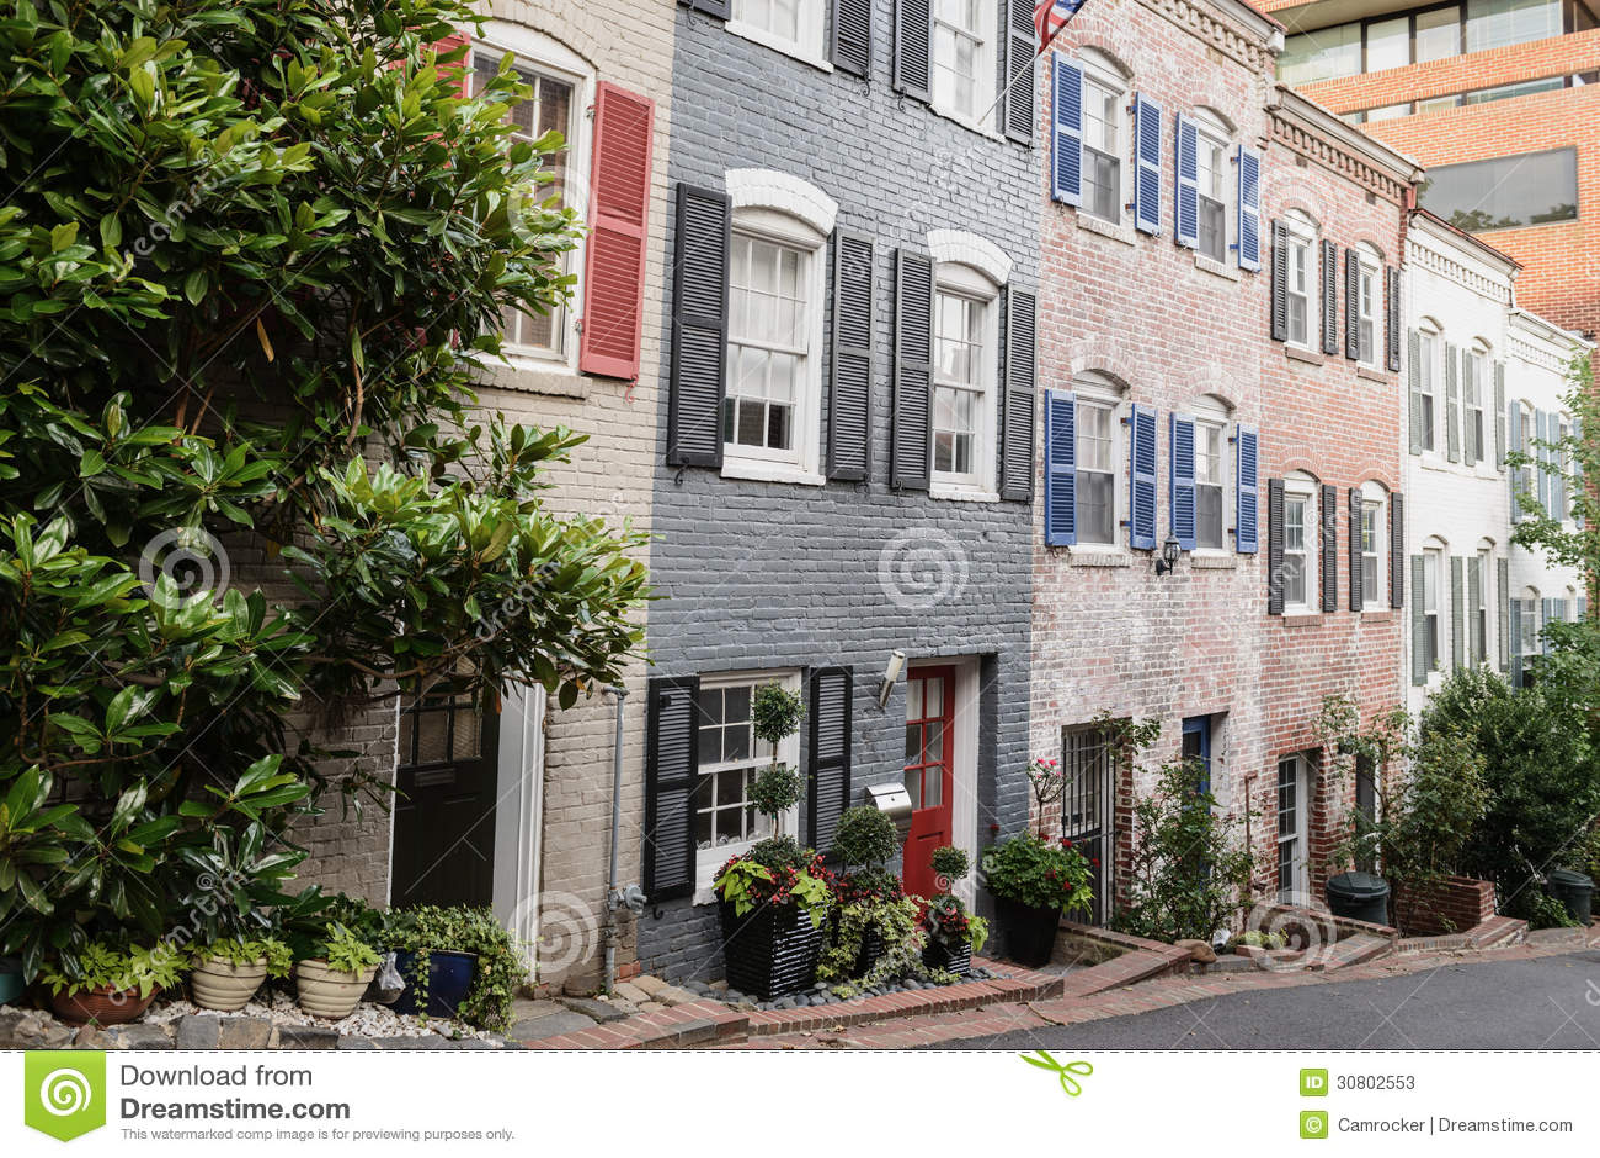 Townhouses στην Τζωρτζτάουν, Washington DC